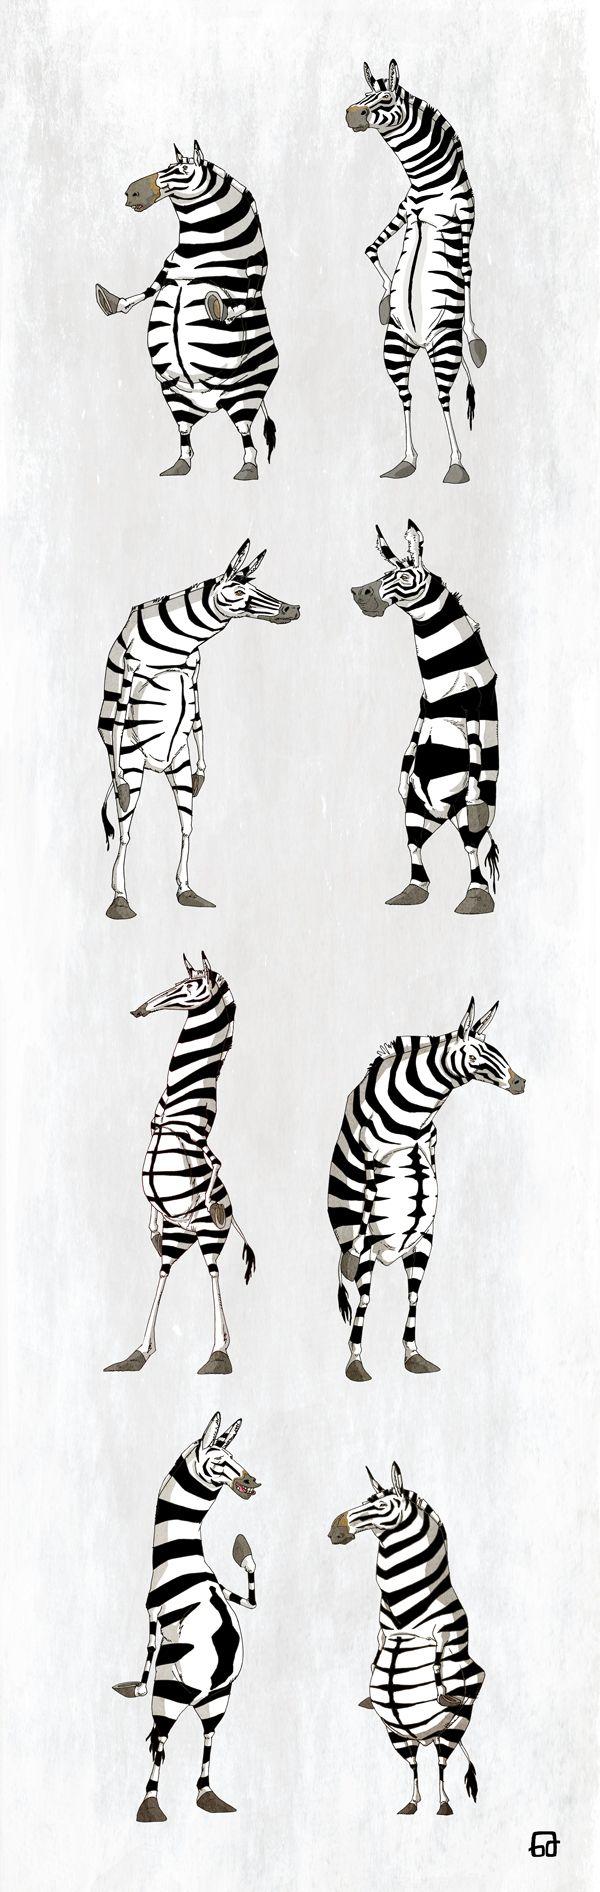 Character Design by Gorka Aranburu S., via Behance